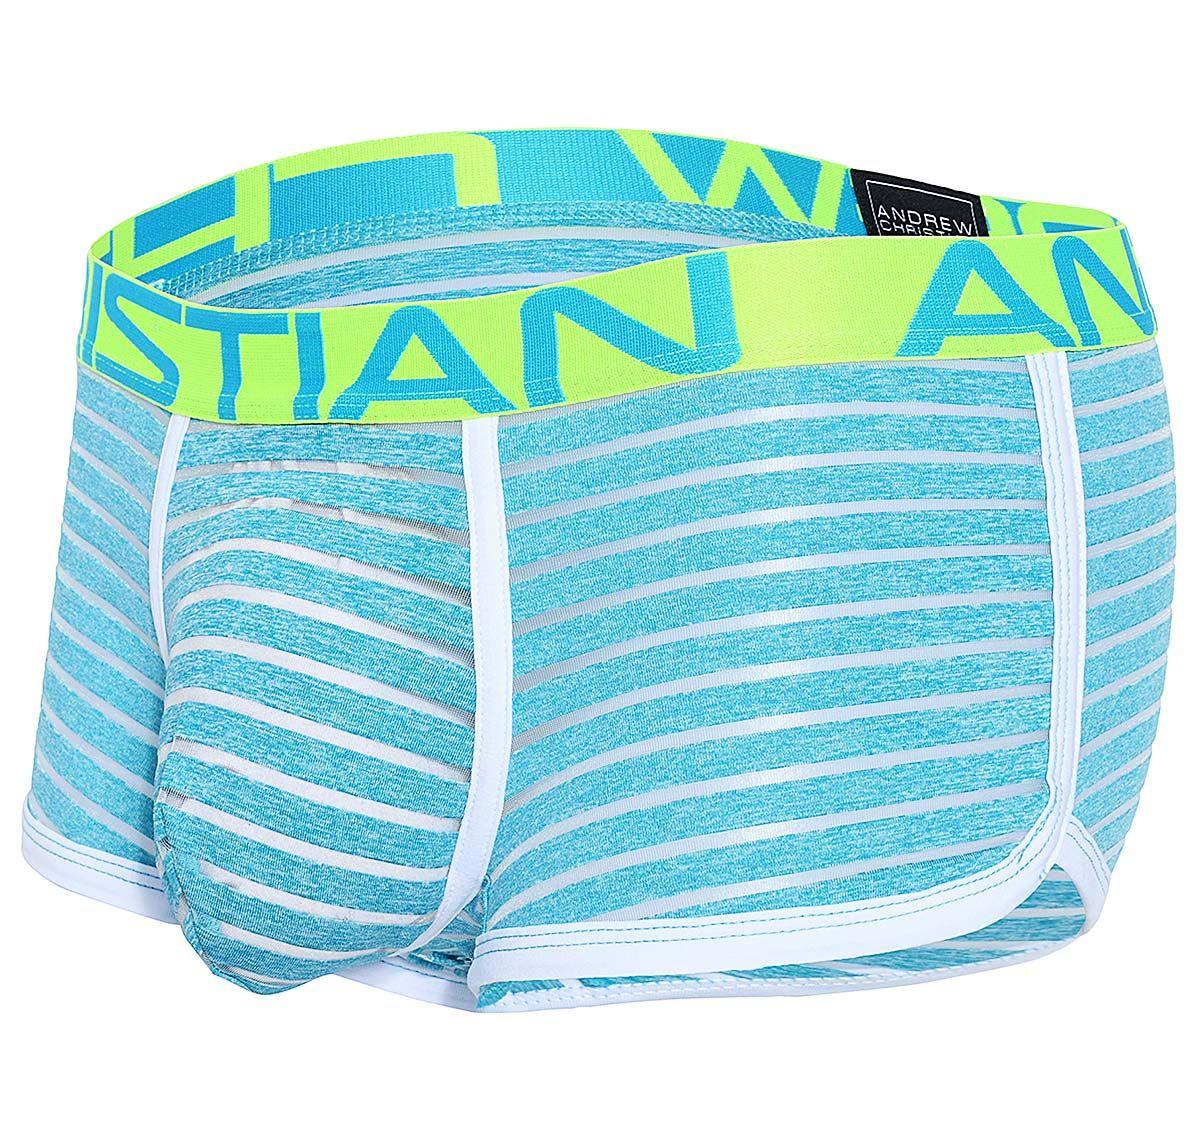 Andrew Christian Boxershorts AQUA SHEER STRIPE BOXER w/ ALMOST NAKED 91388, blau